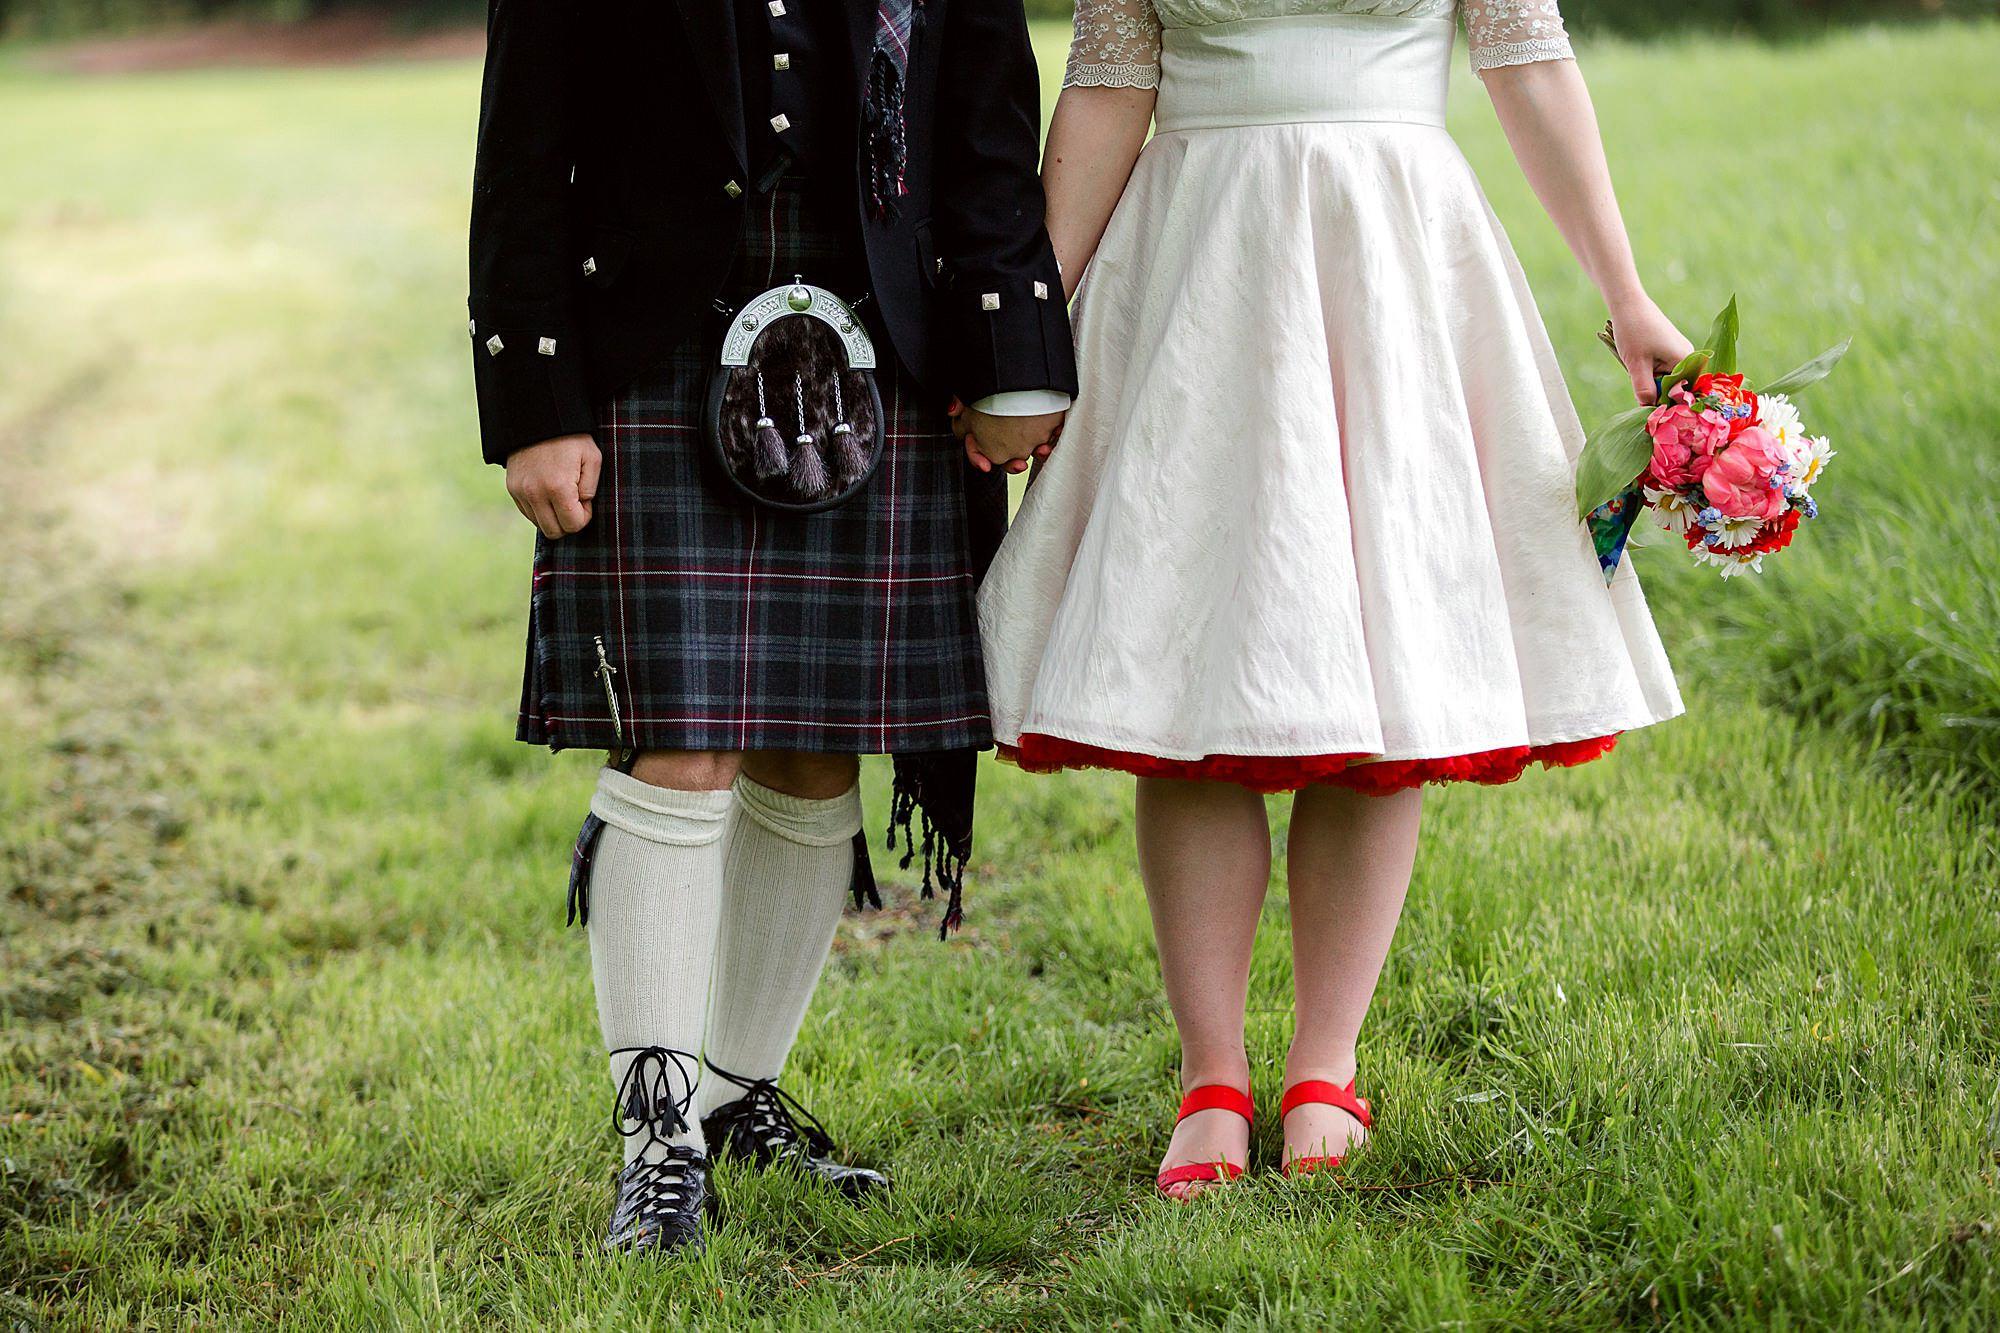 close up of bride's skirt and groom's kilt at Fun DIY wedding